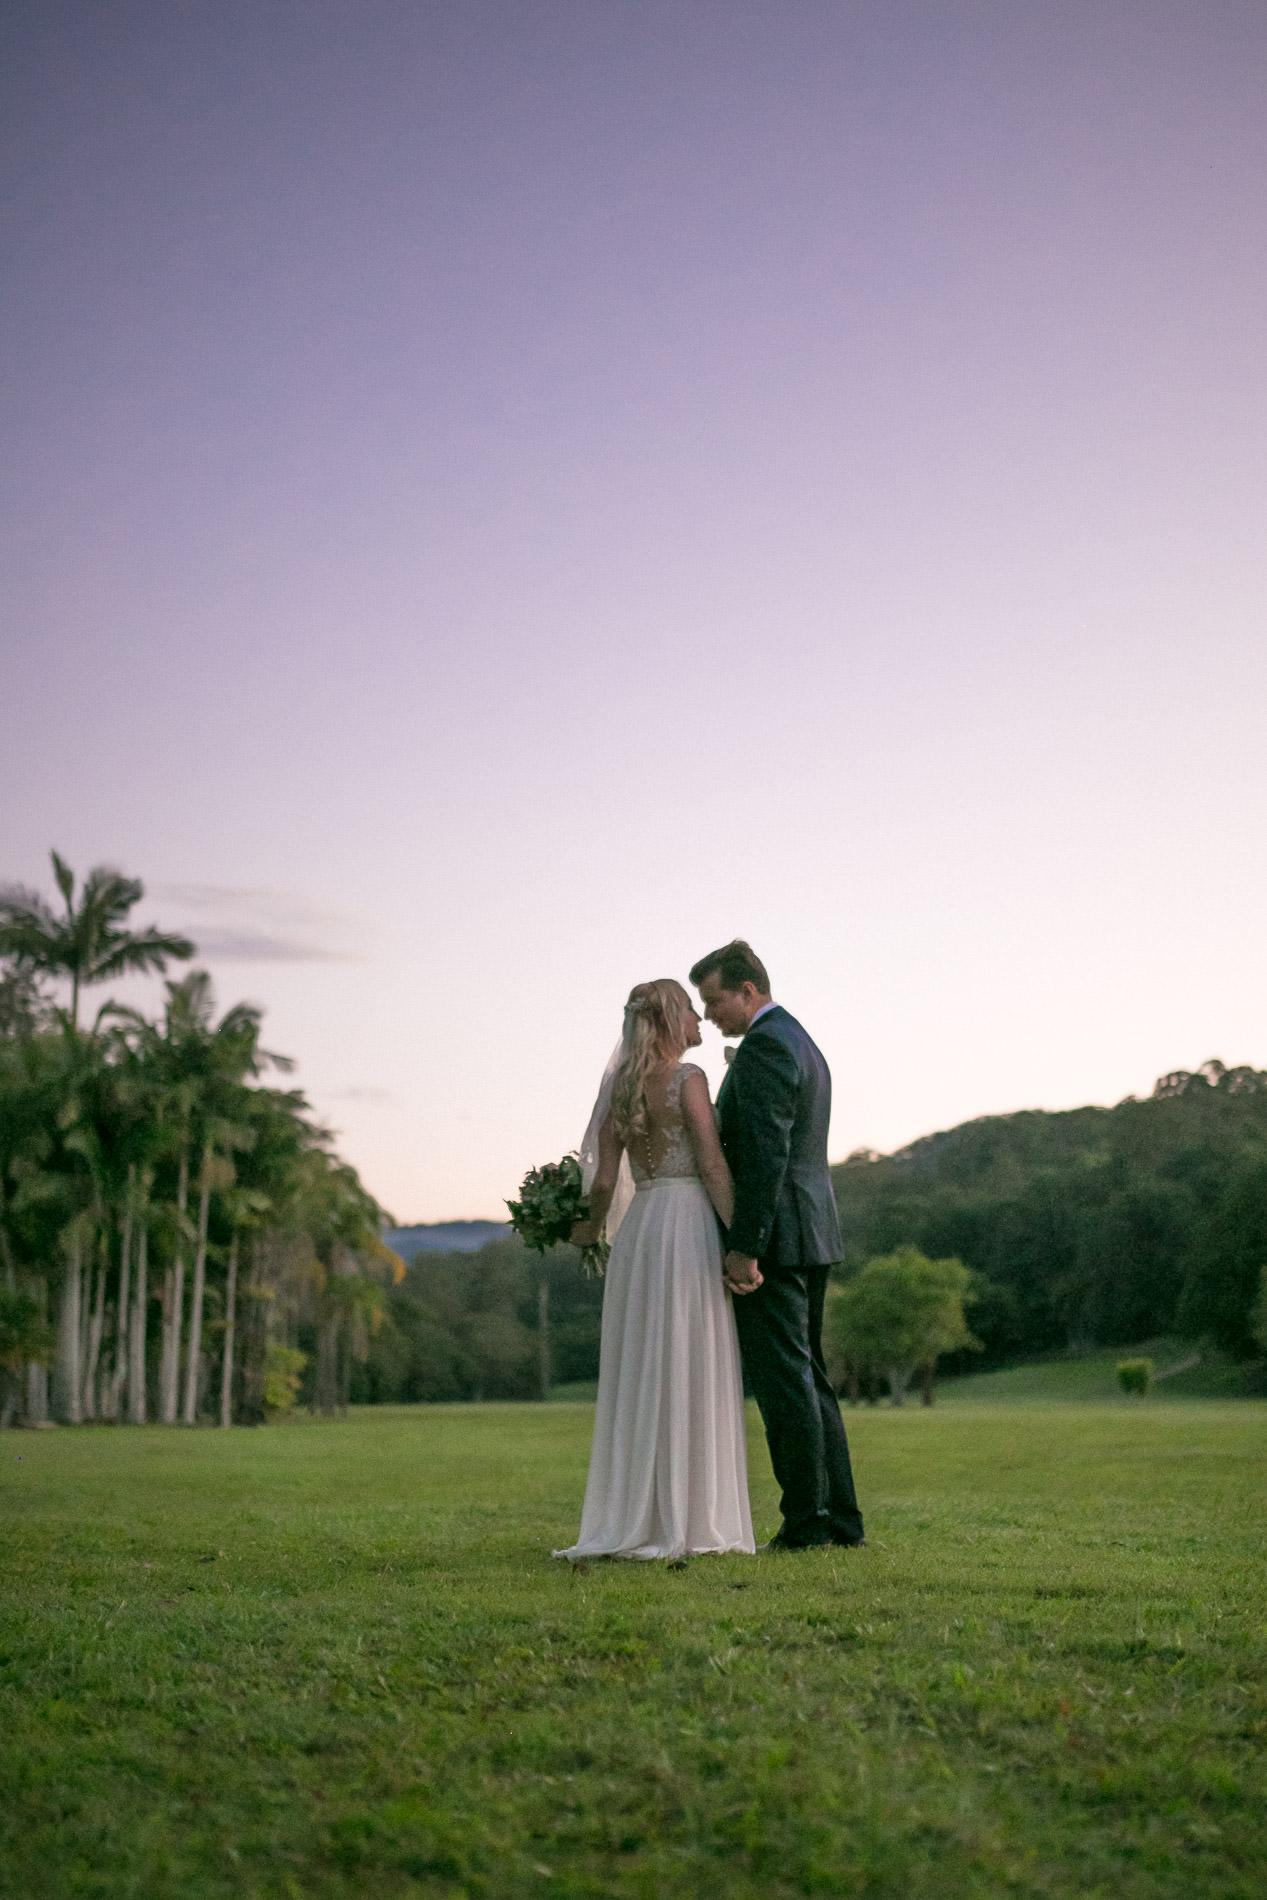 True North Photography_Boomerang Farm_Stacey and Isaac_Gold Coast Wedding_Barm Wedding_Hinterland Wedding-177.jpg